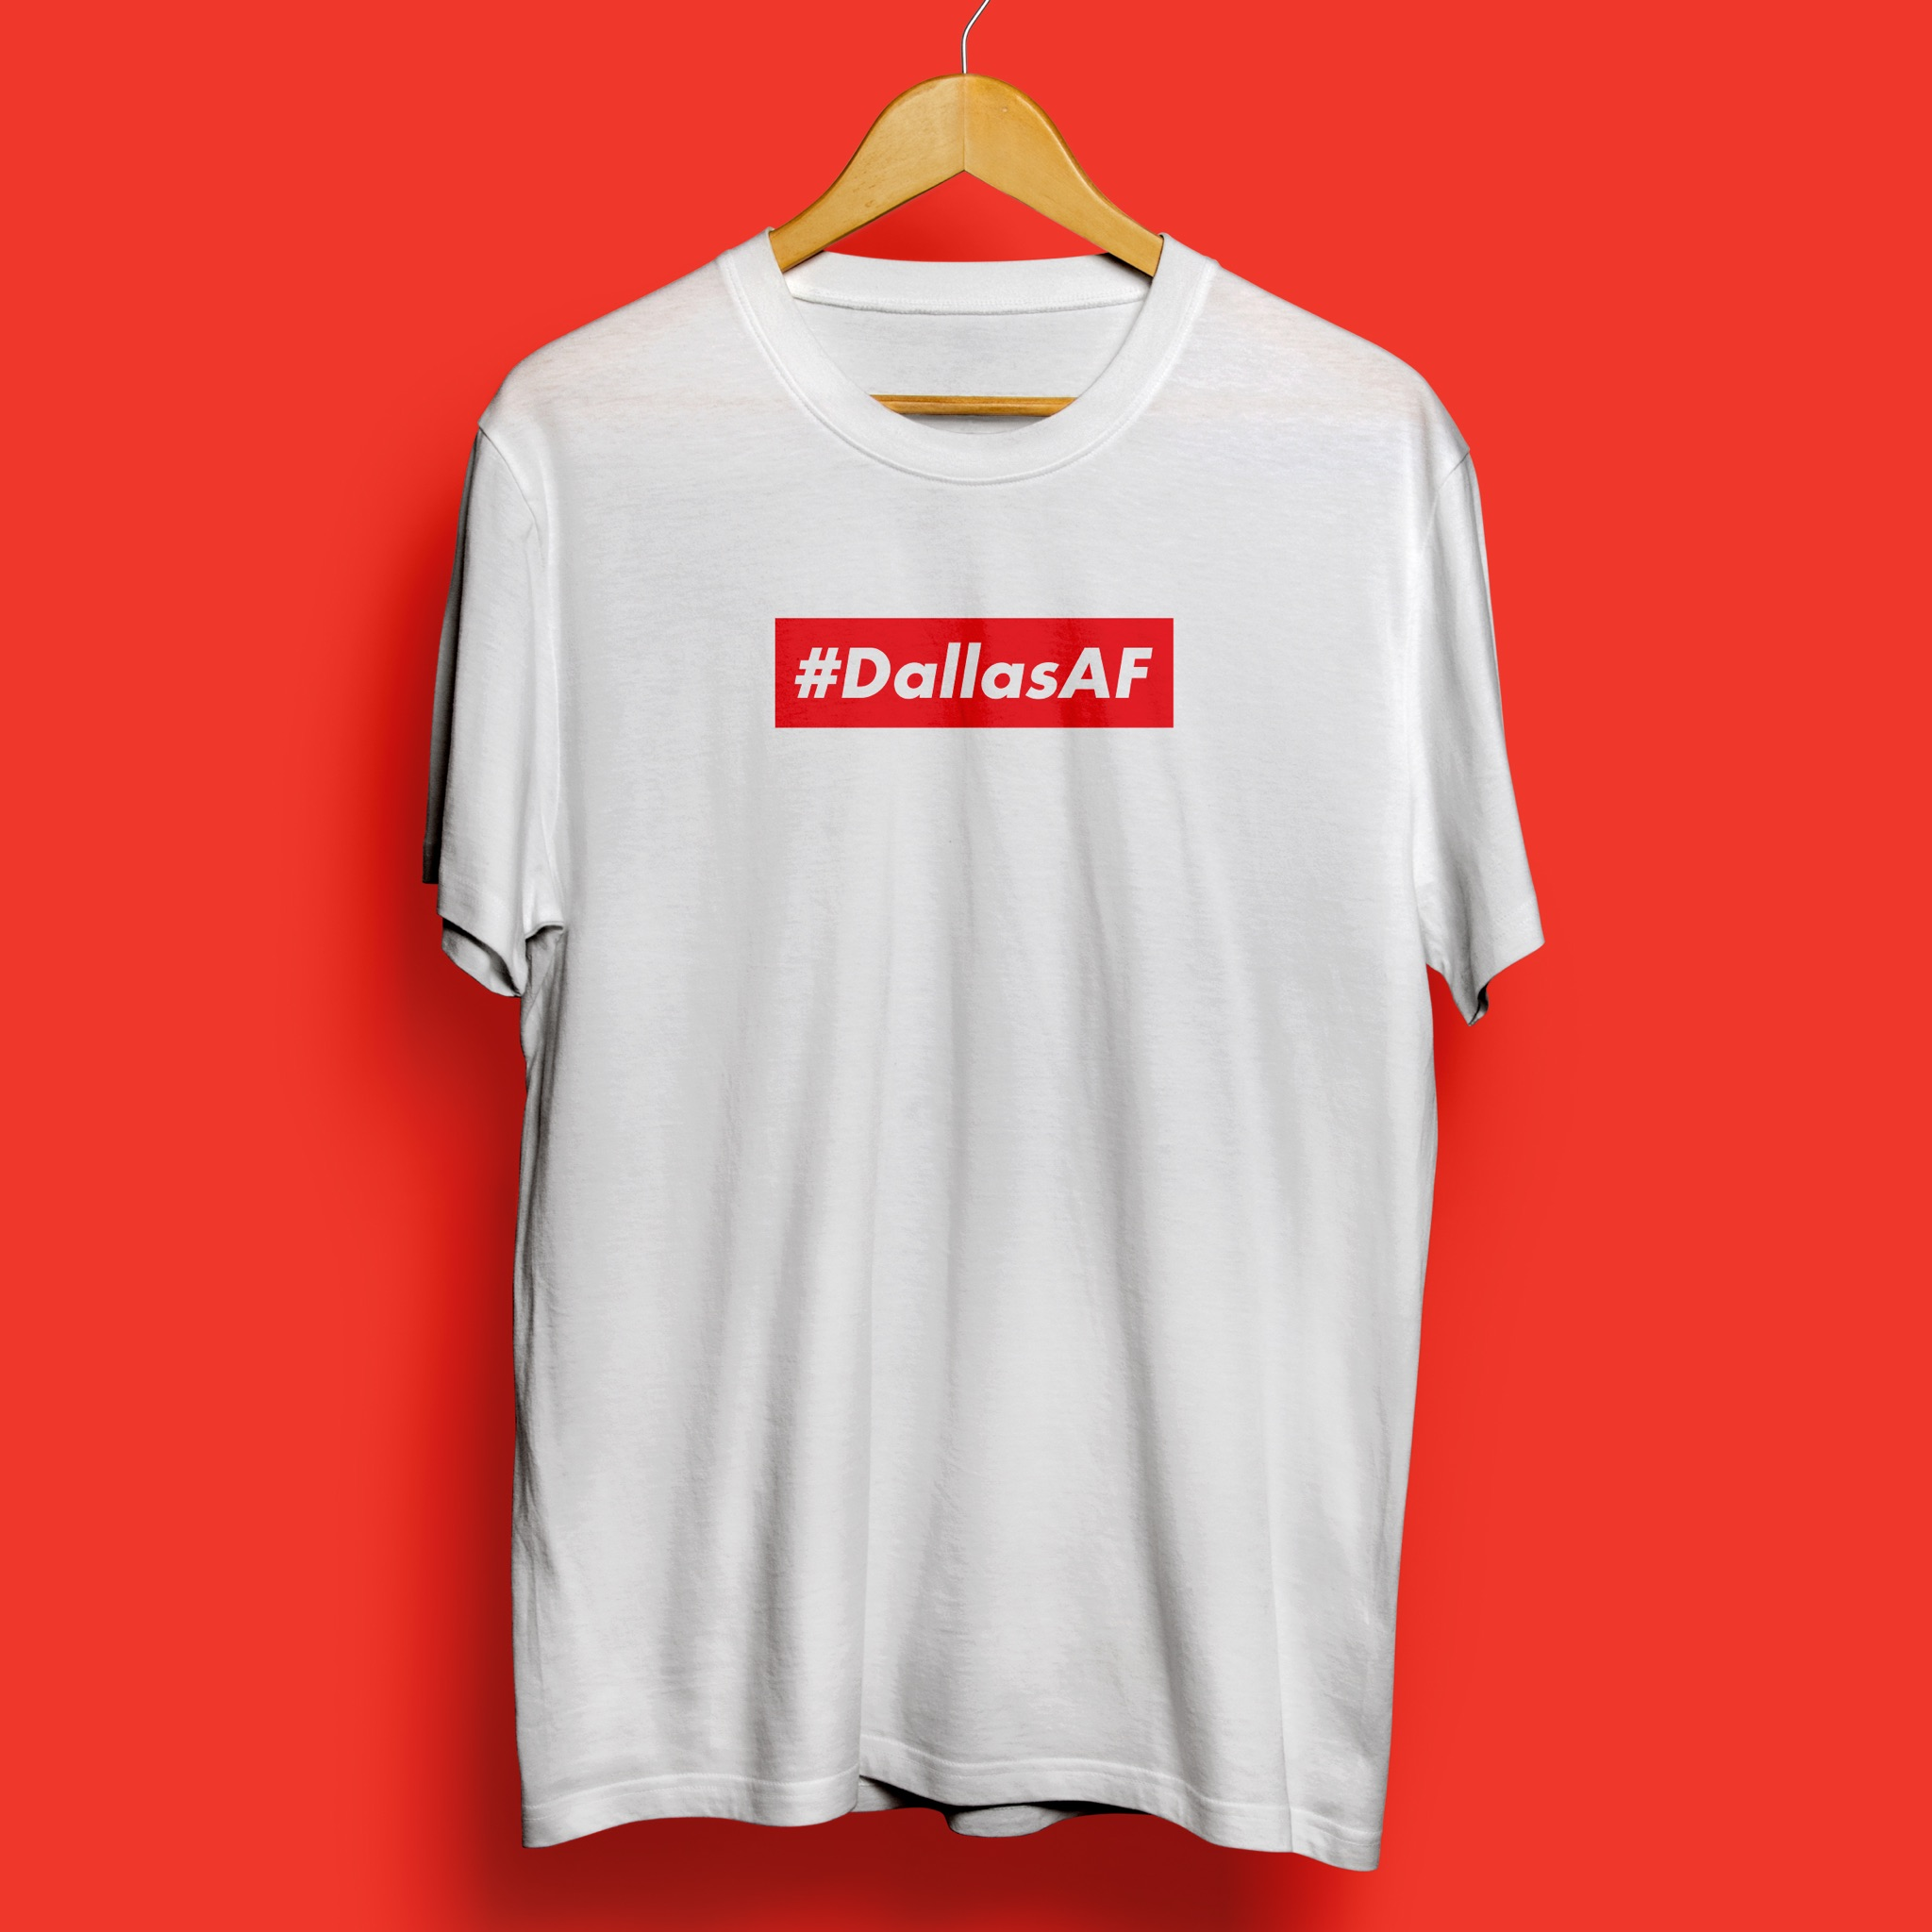 9eaef333d375  DallasAF  Supreme RipOff Unisex T-shirt - Central Track